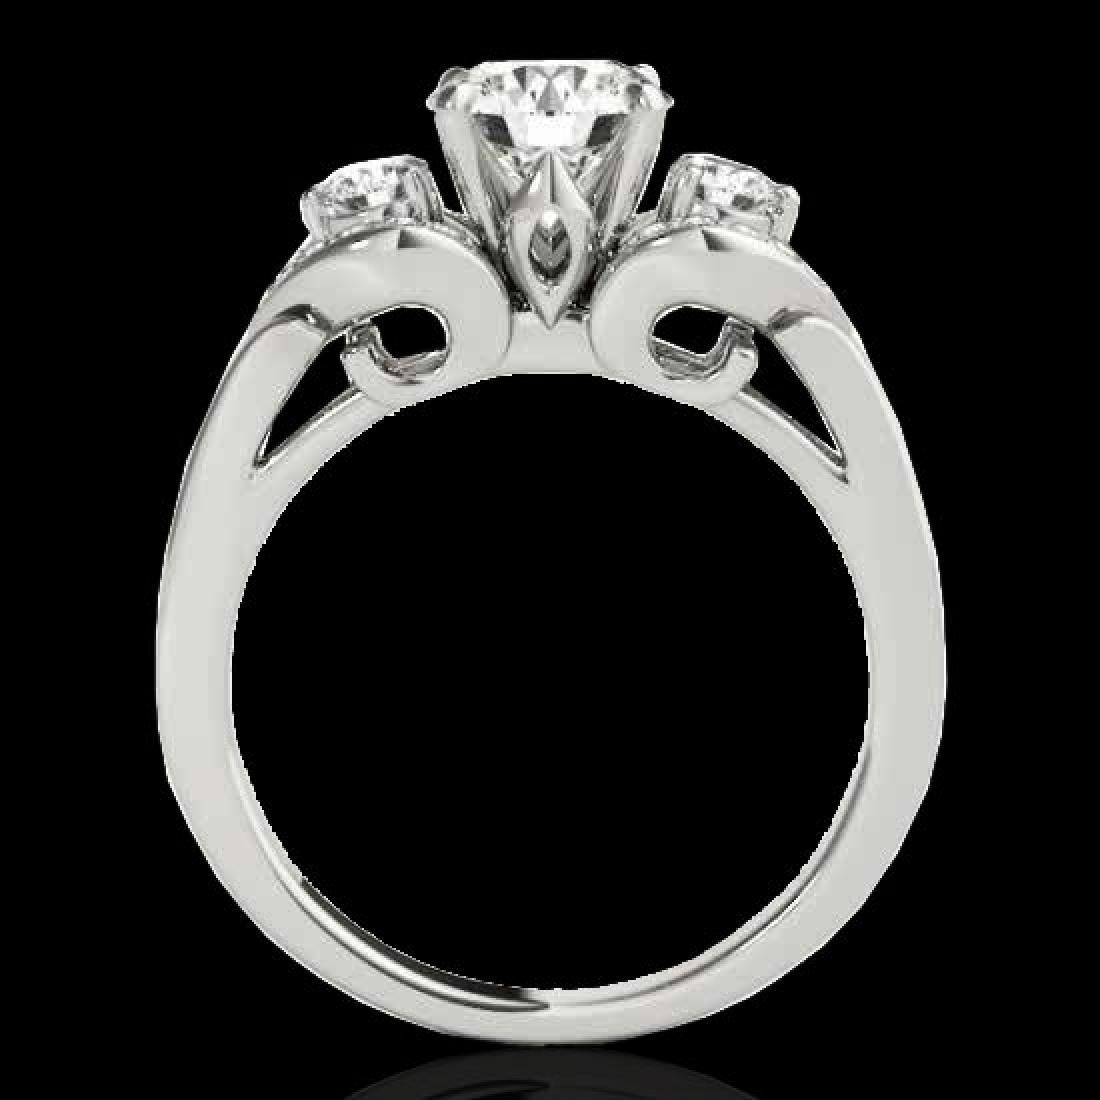 1.7 CTW H-SI/I Certified Diamond 3 Stone Ring 10K White - 2